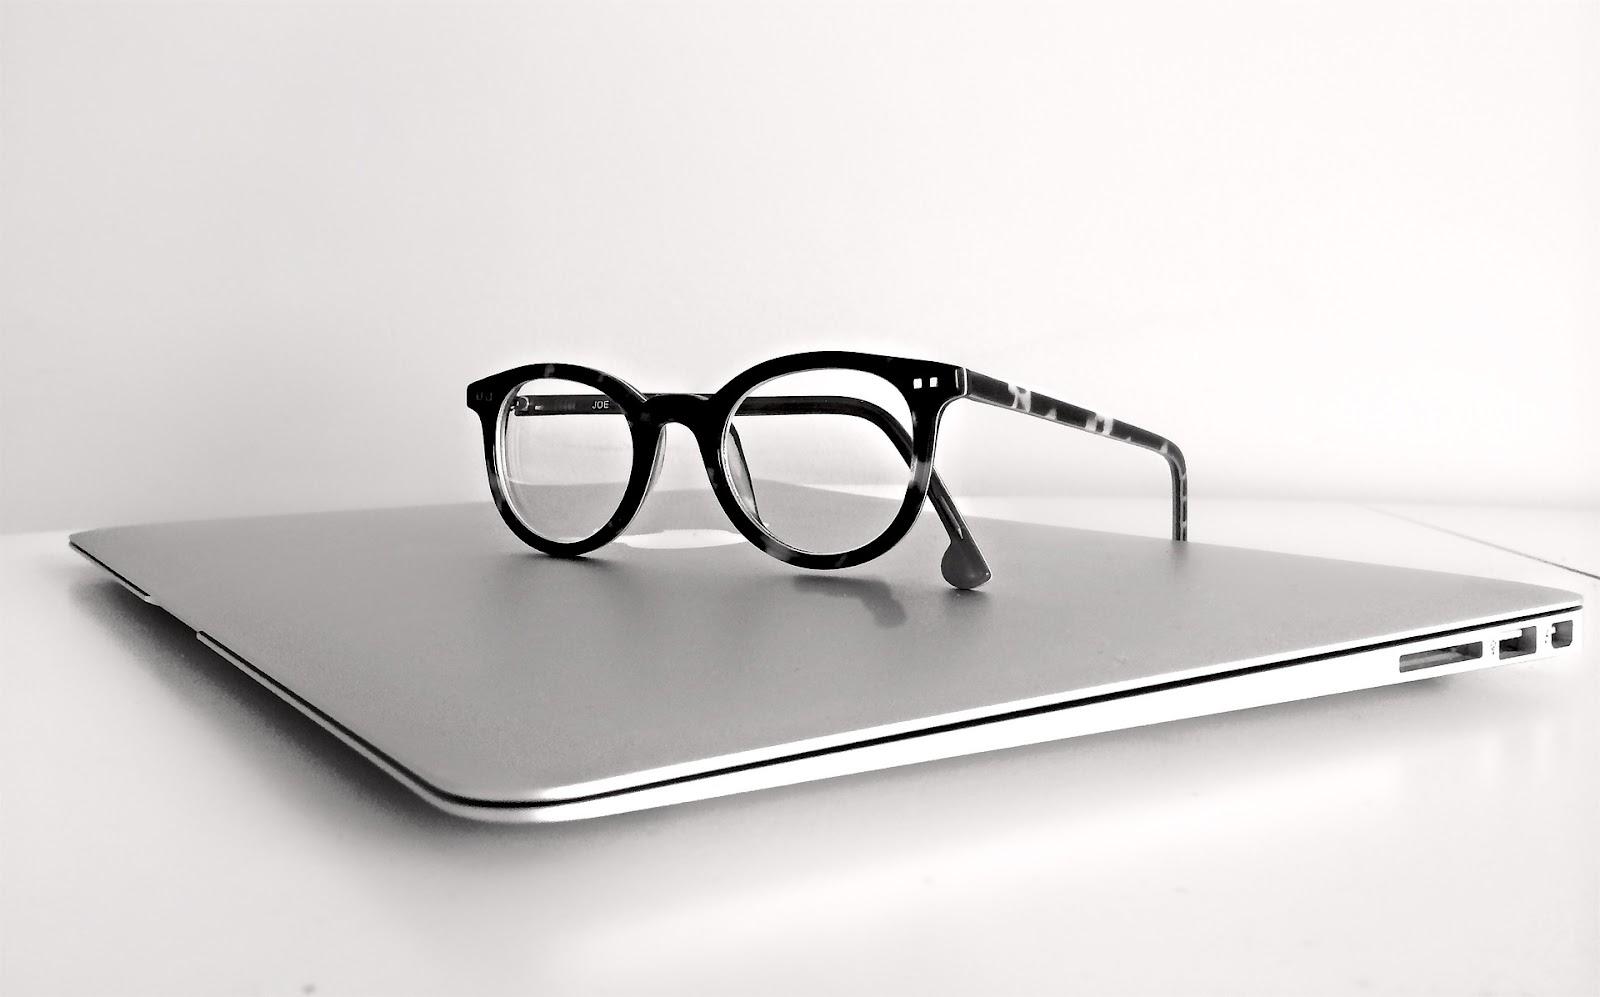 macbook-1526449_1920.jpg